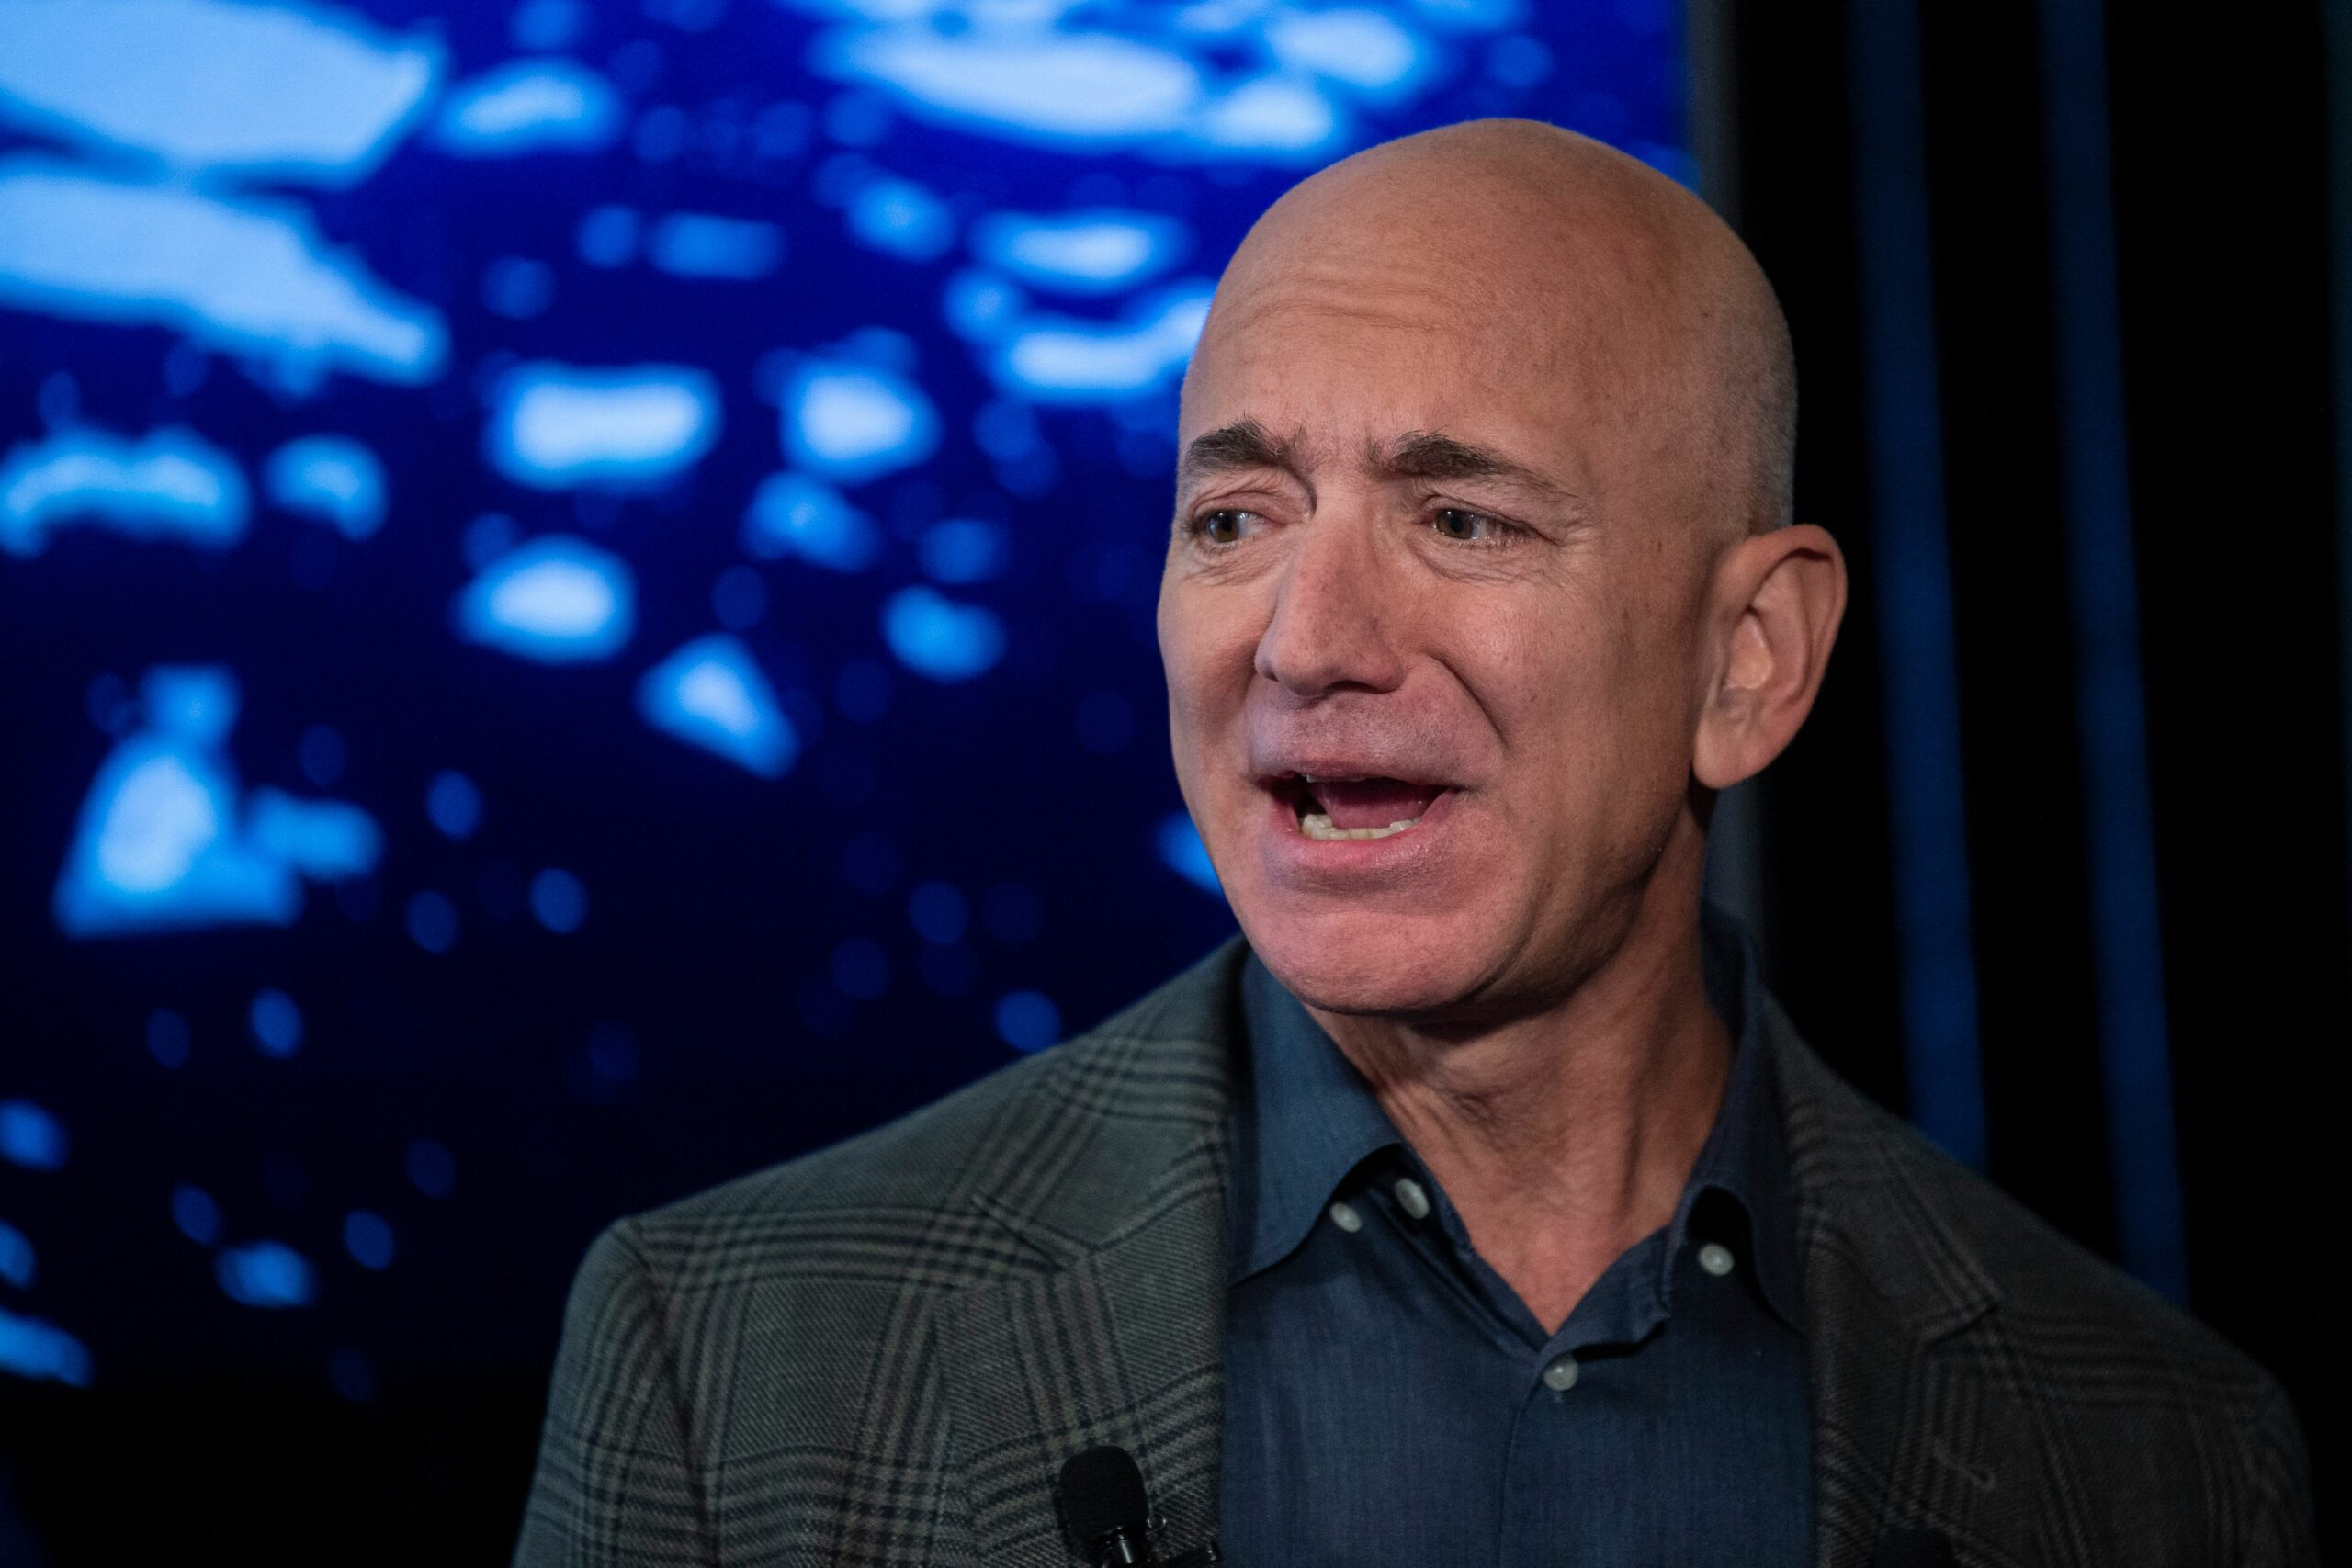 Bezos sells more than $3 billion in Amazon shares